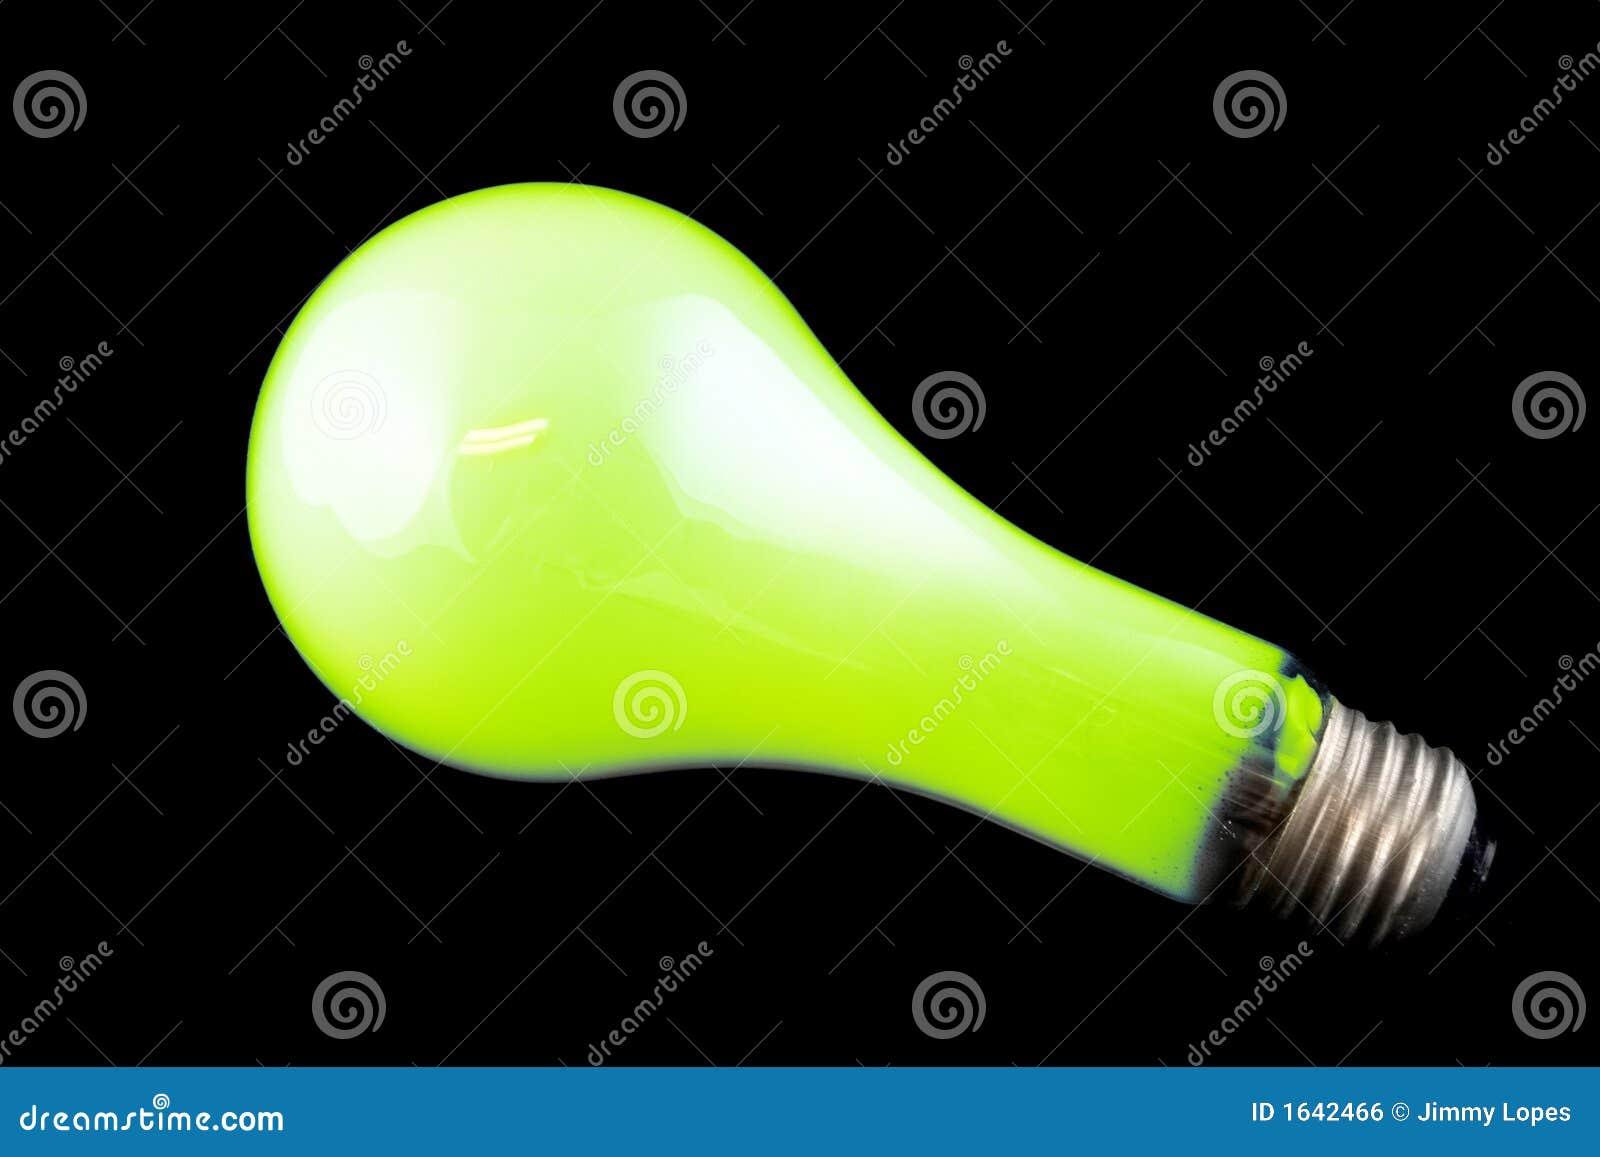 Bright Green Light Bulb Royalty Free Stock Image Image 1642466